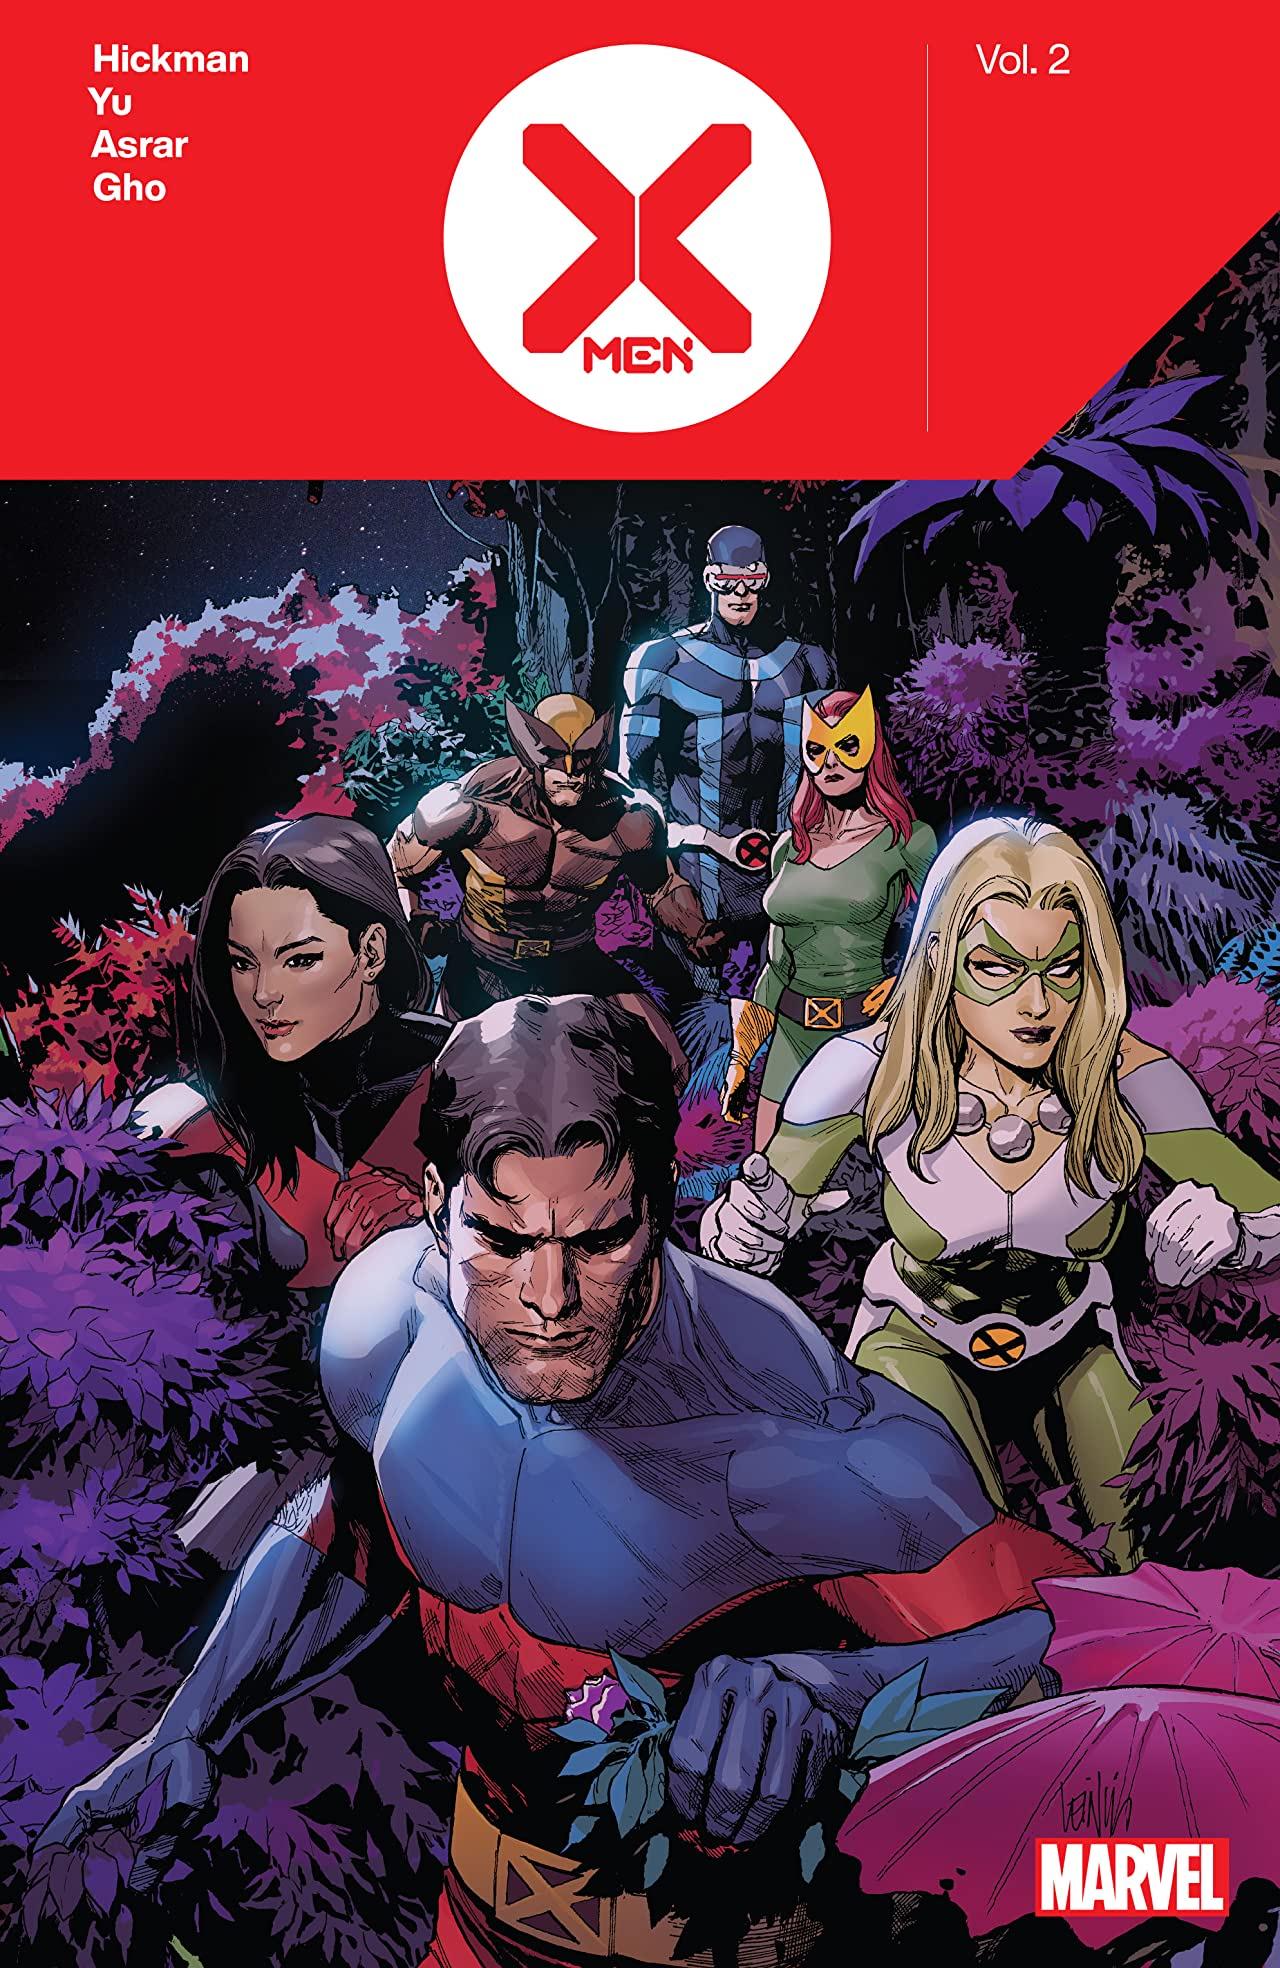 X-MEN BY JONATHAN HICKMAN VOL. 2 TPB (Trade Paperback)